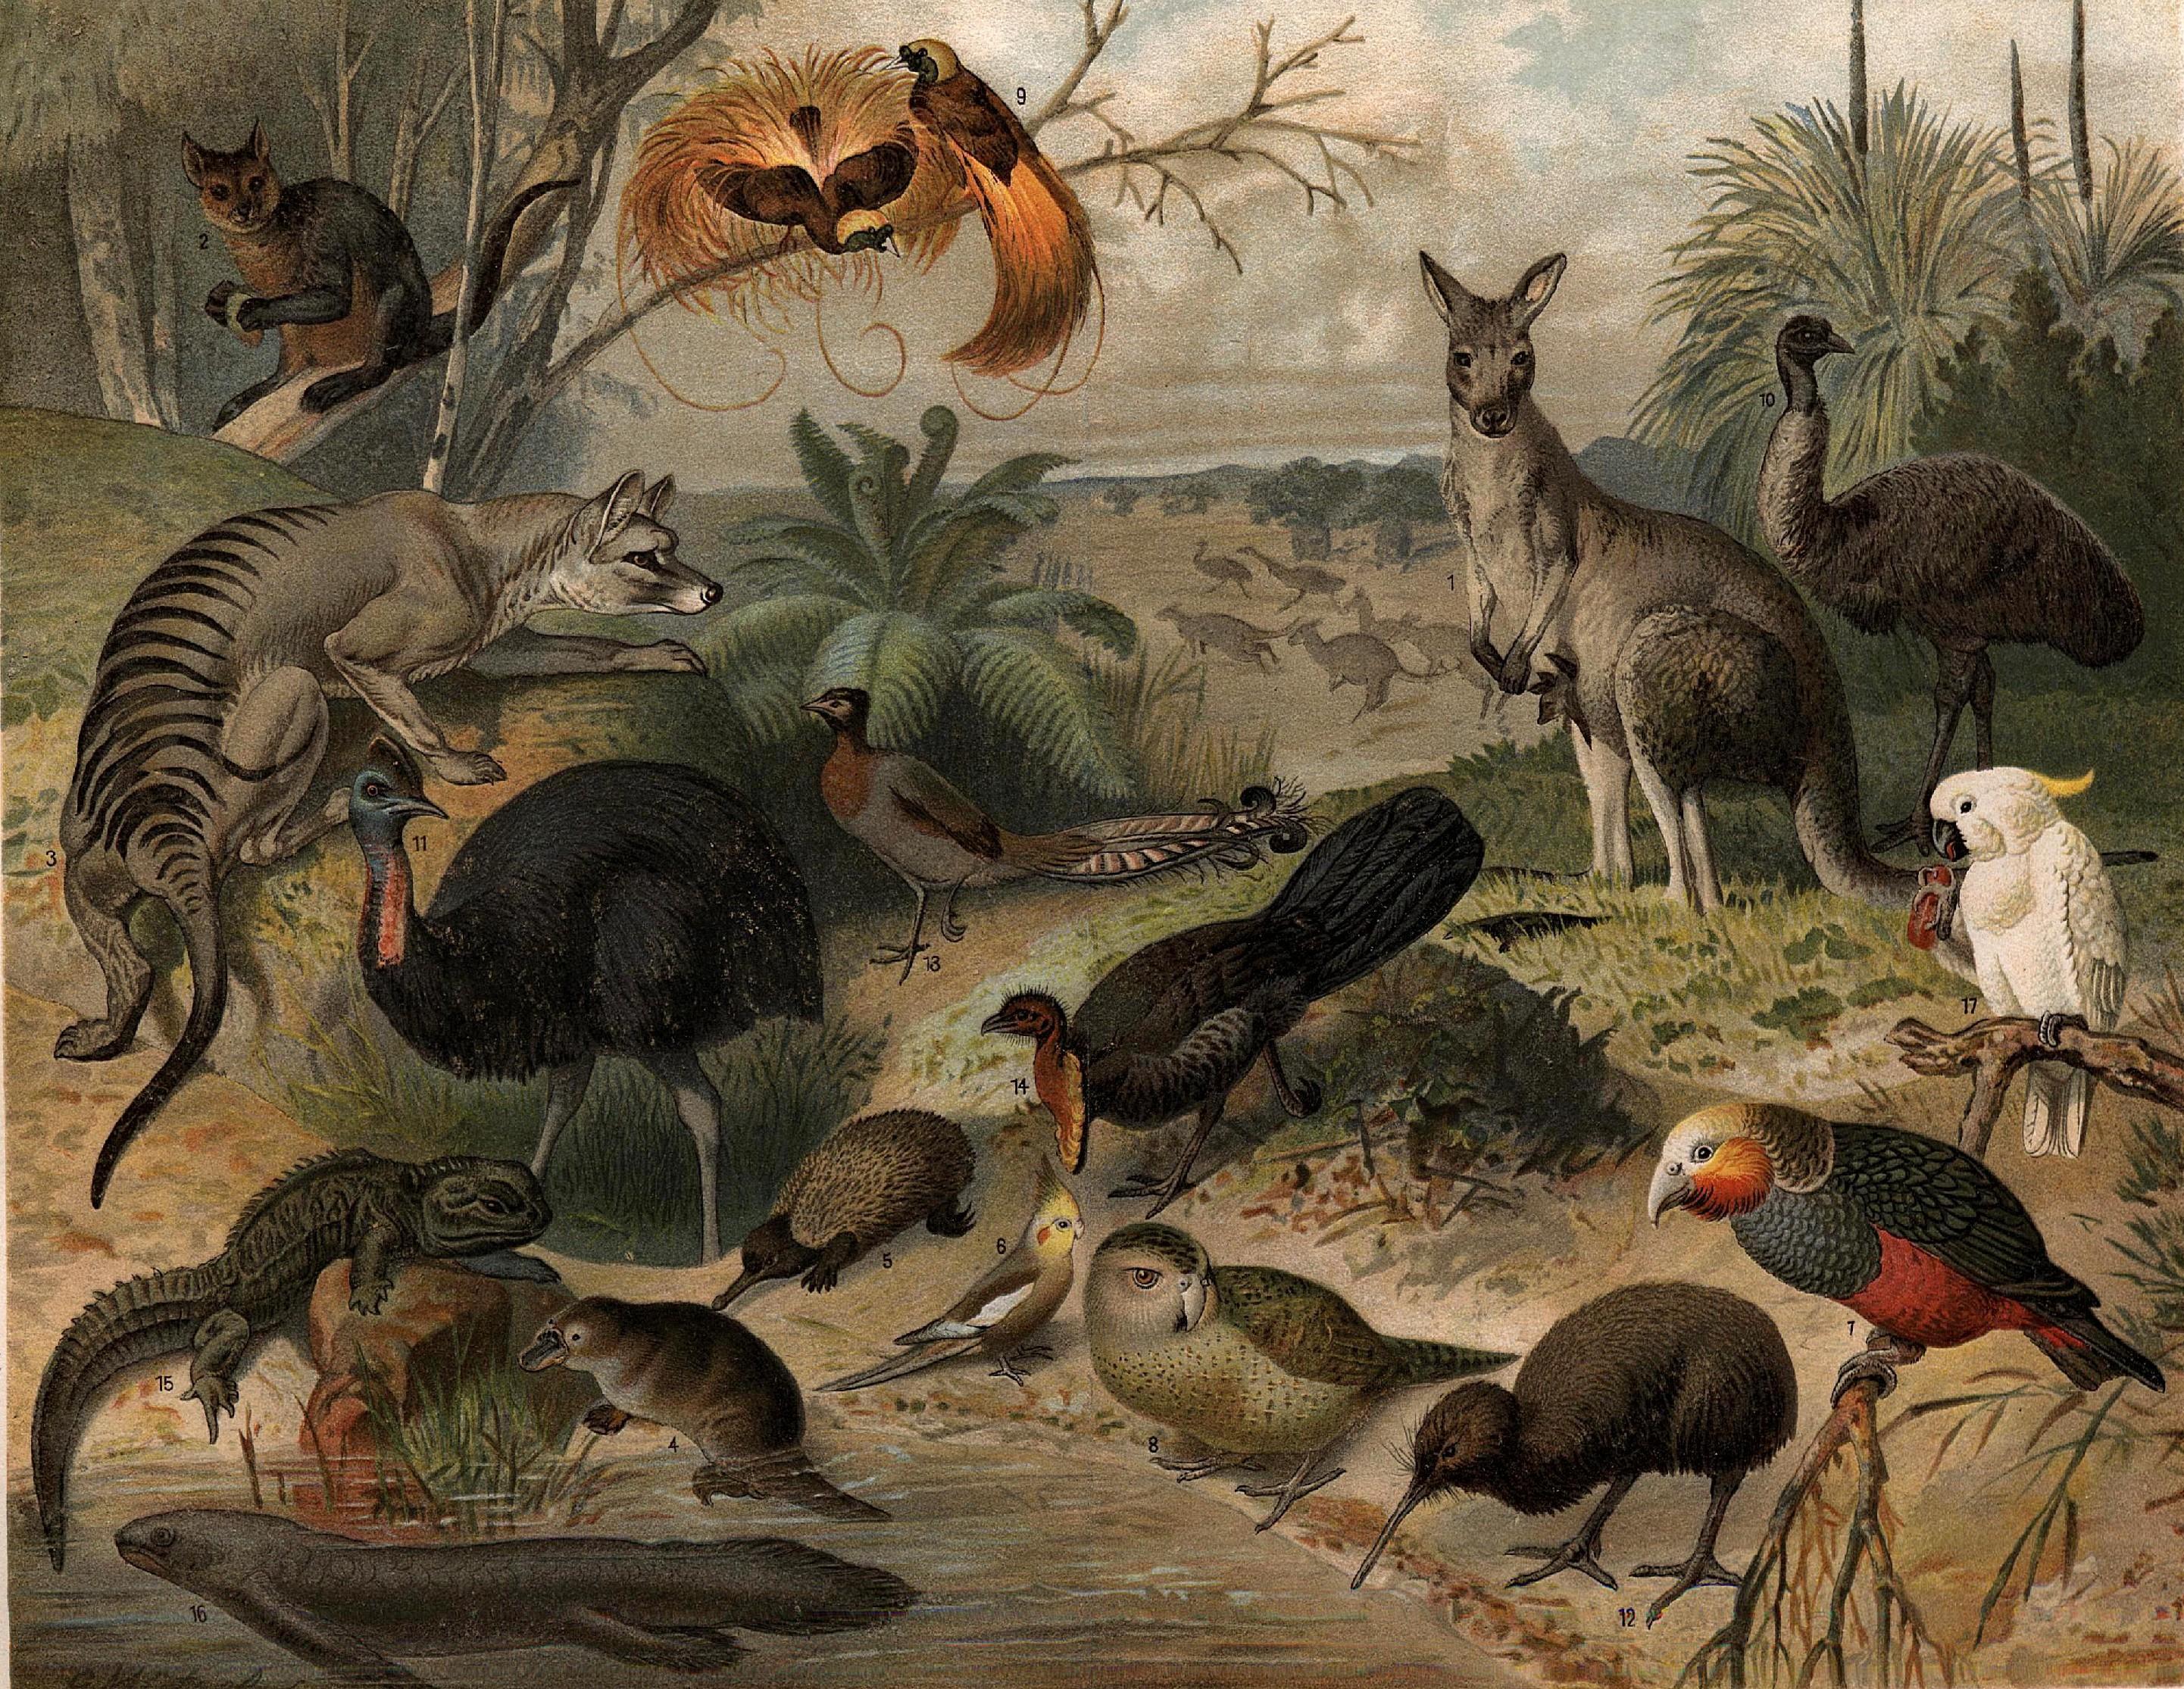 https://i1.wp.com/upload.wikimedia.org/wikipedia/commons/f/fc/Australisk_fauna,_Nordisk_familjebok.jpg